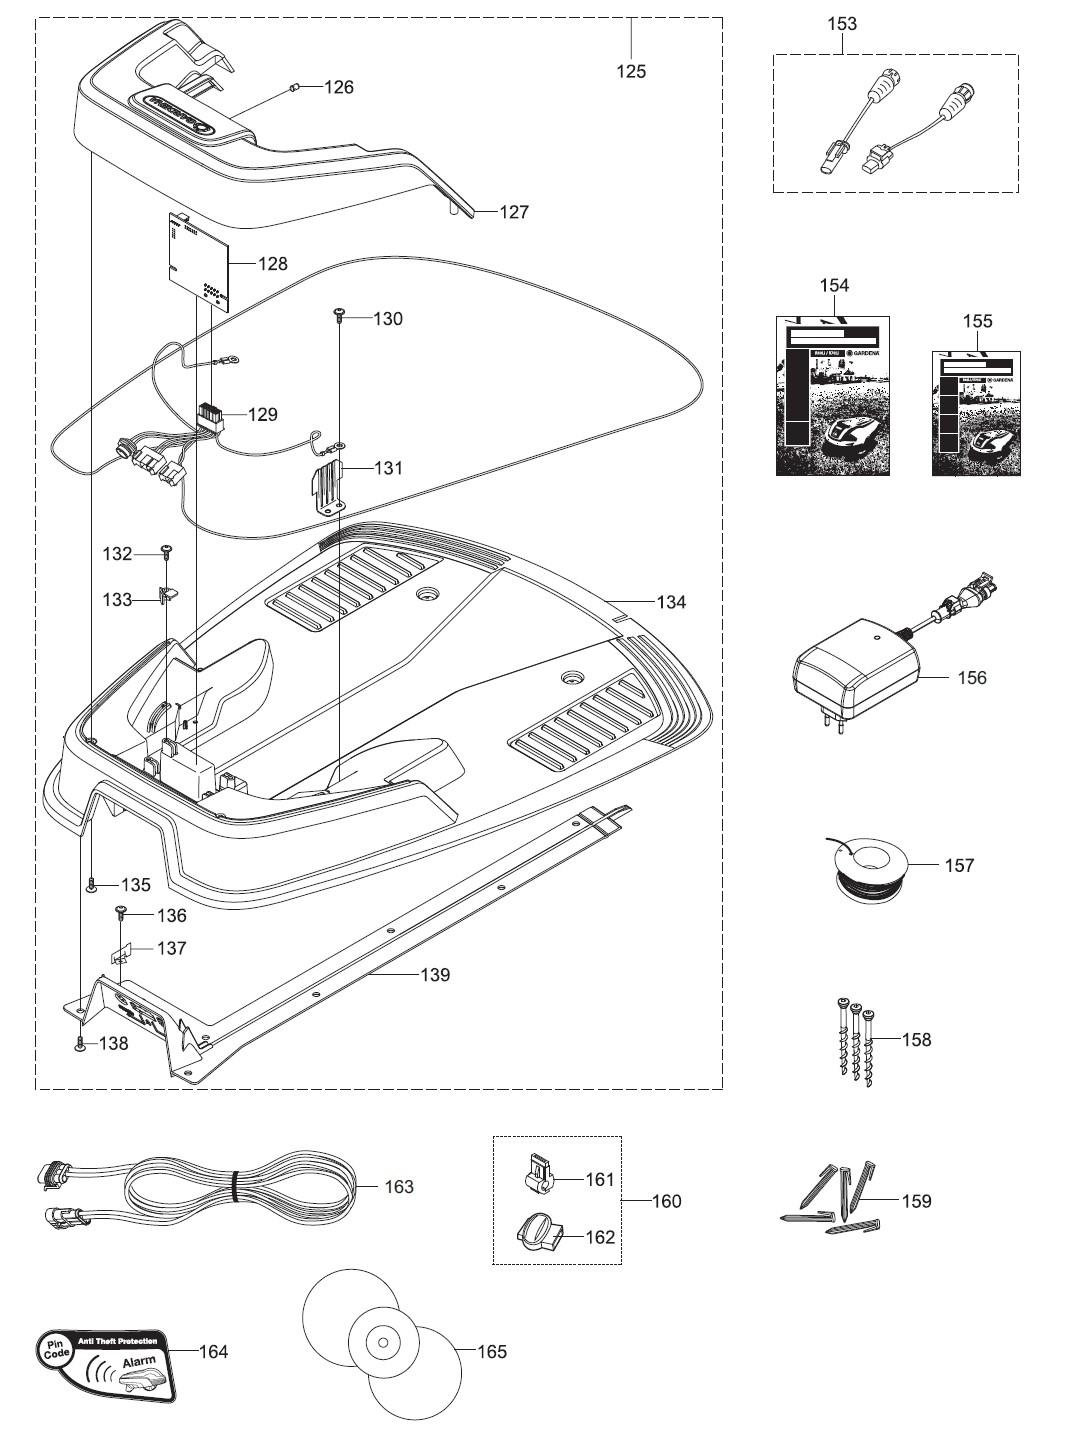 gardena ersatzteile ladestation m hroboter r40li 4071 20 bj nov 2013 2015 seriennummer. Black Bedroom Furniture Sets. Home Design Ideas